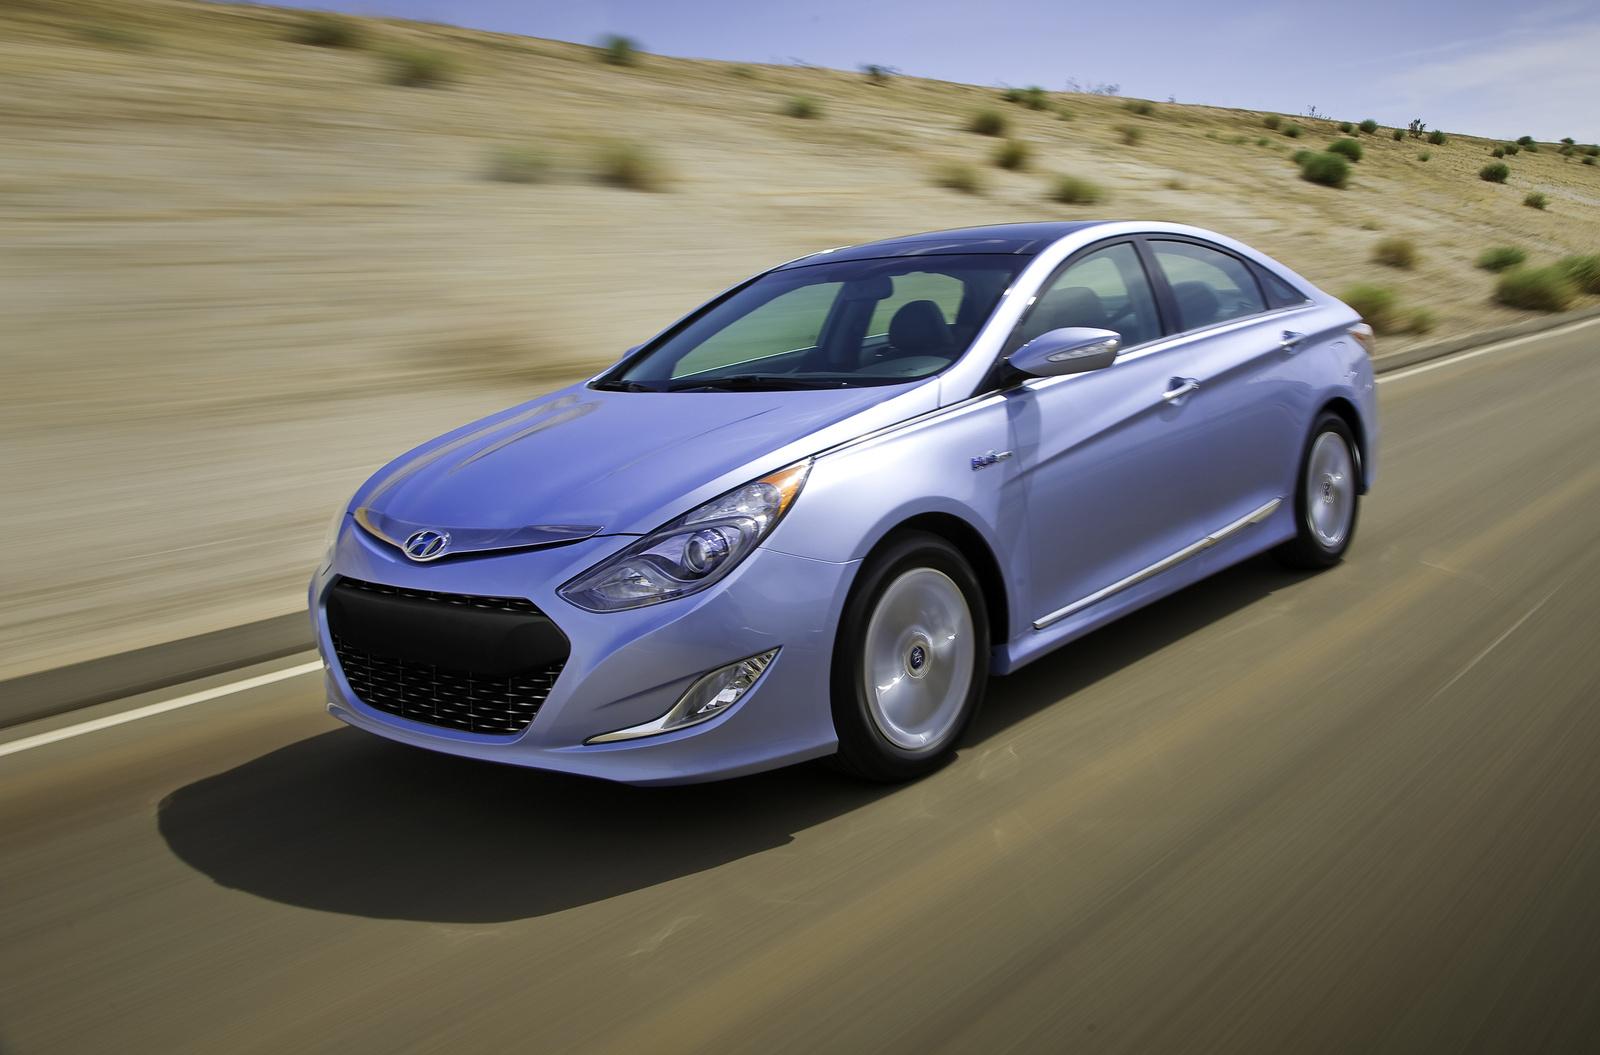 2013 Hyundai Sonata Hybrid Review Cargurus